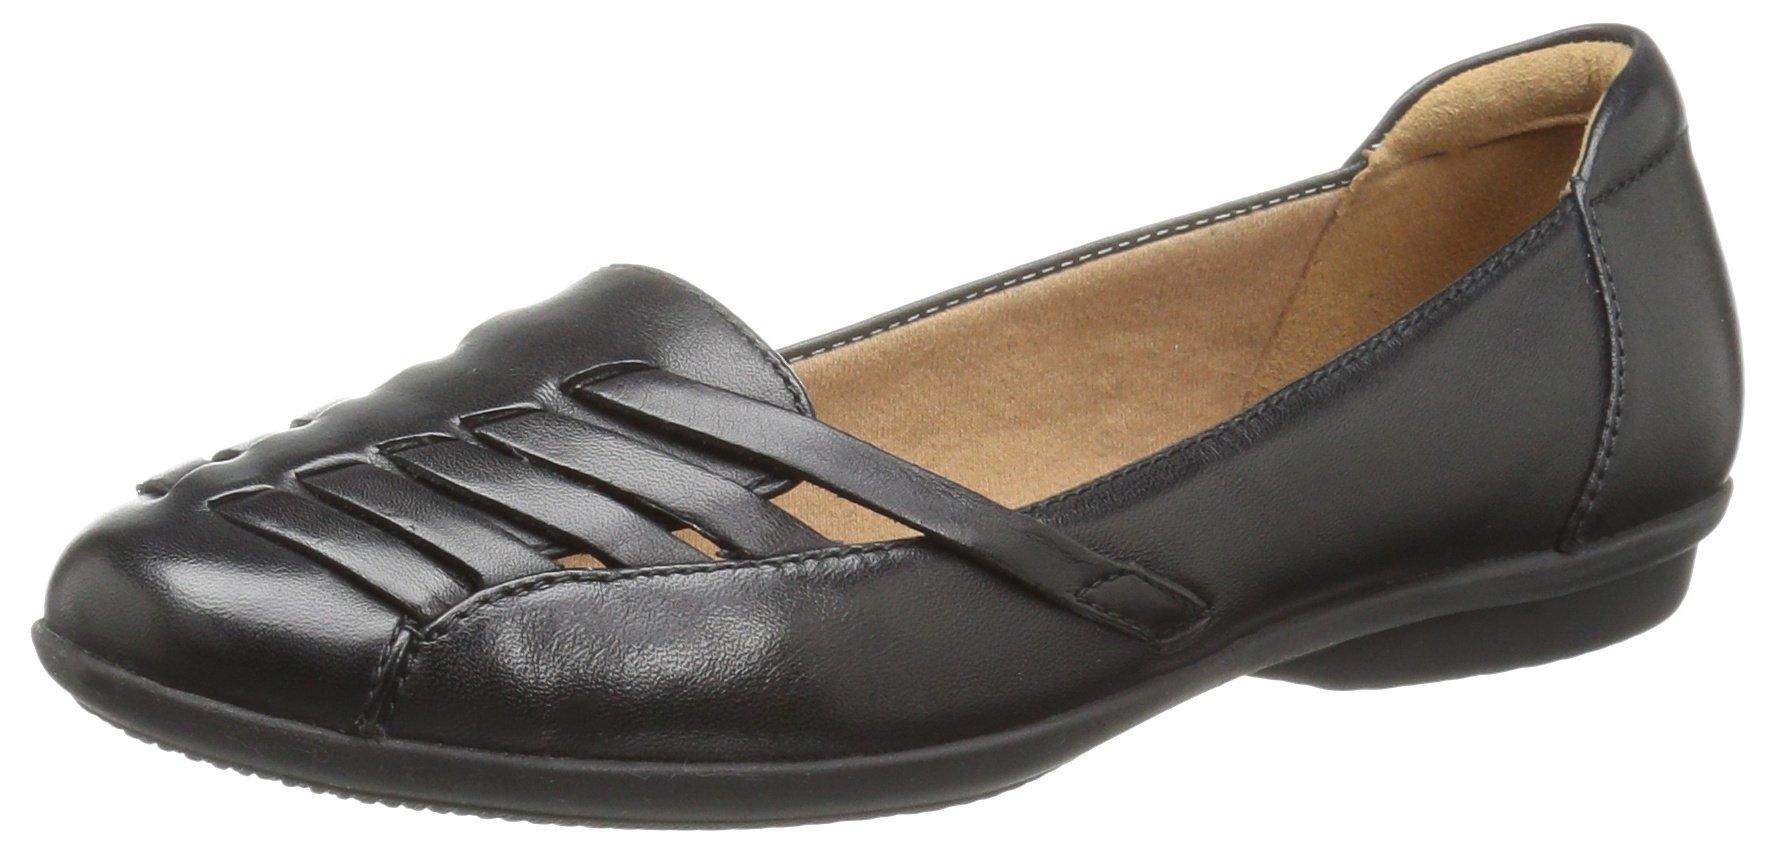 CLARKS Women's Gracelin Gemma Loafer Flat, Black Leather, 10 Medium US